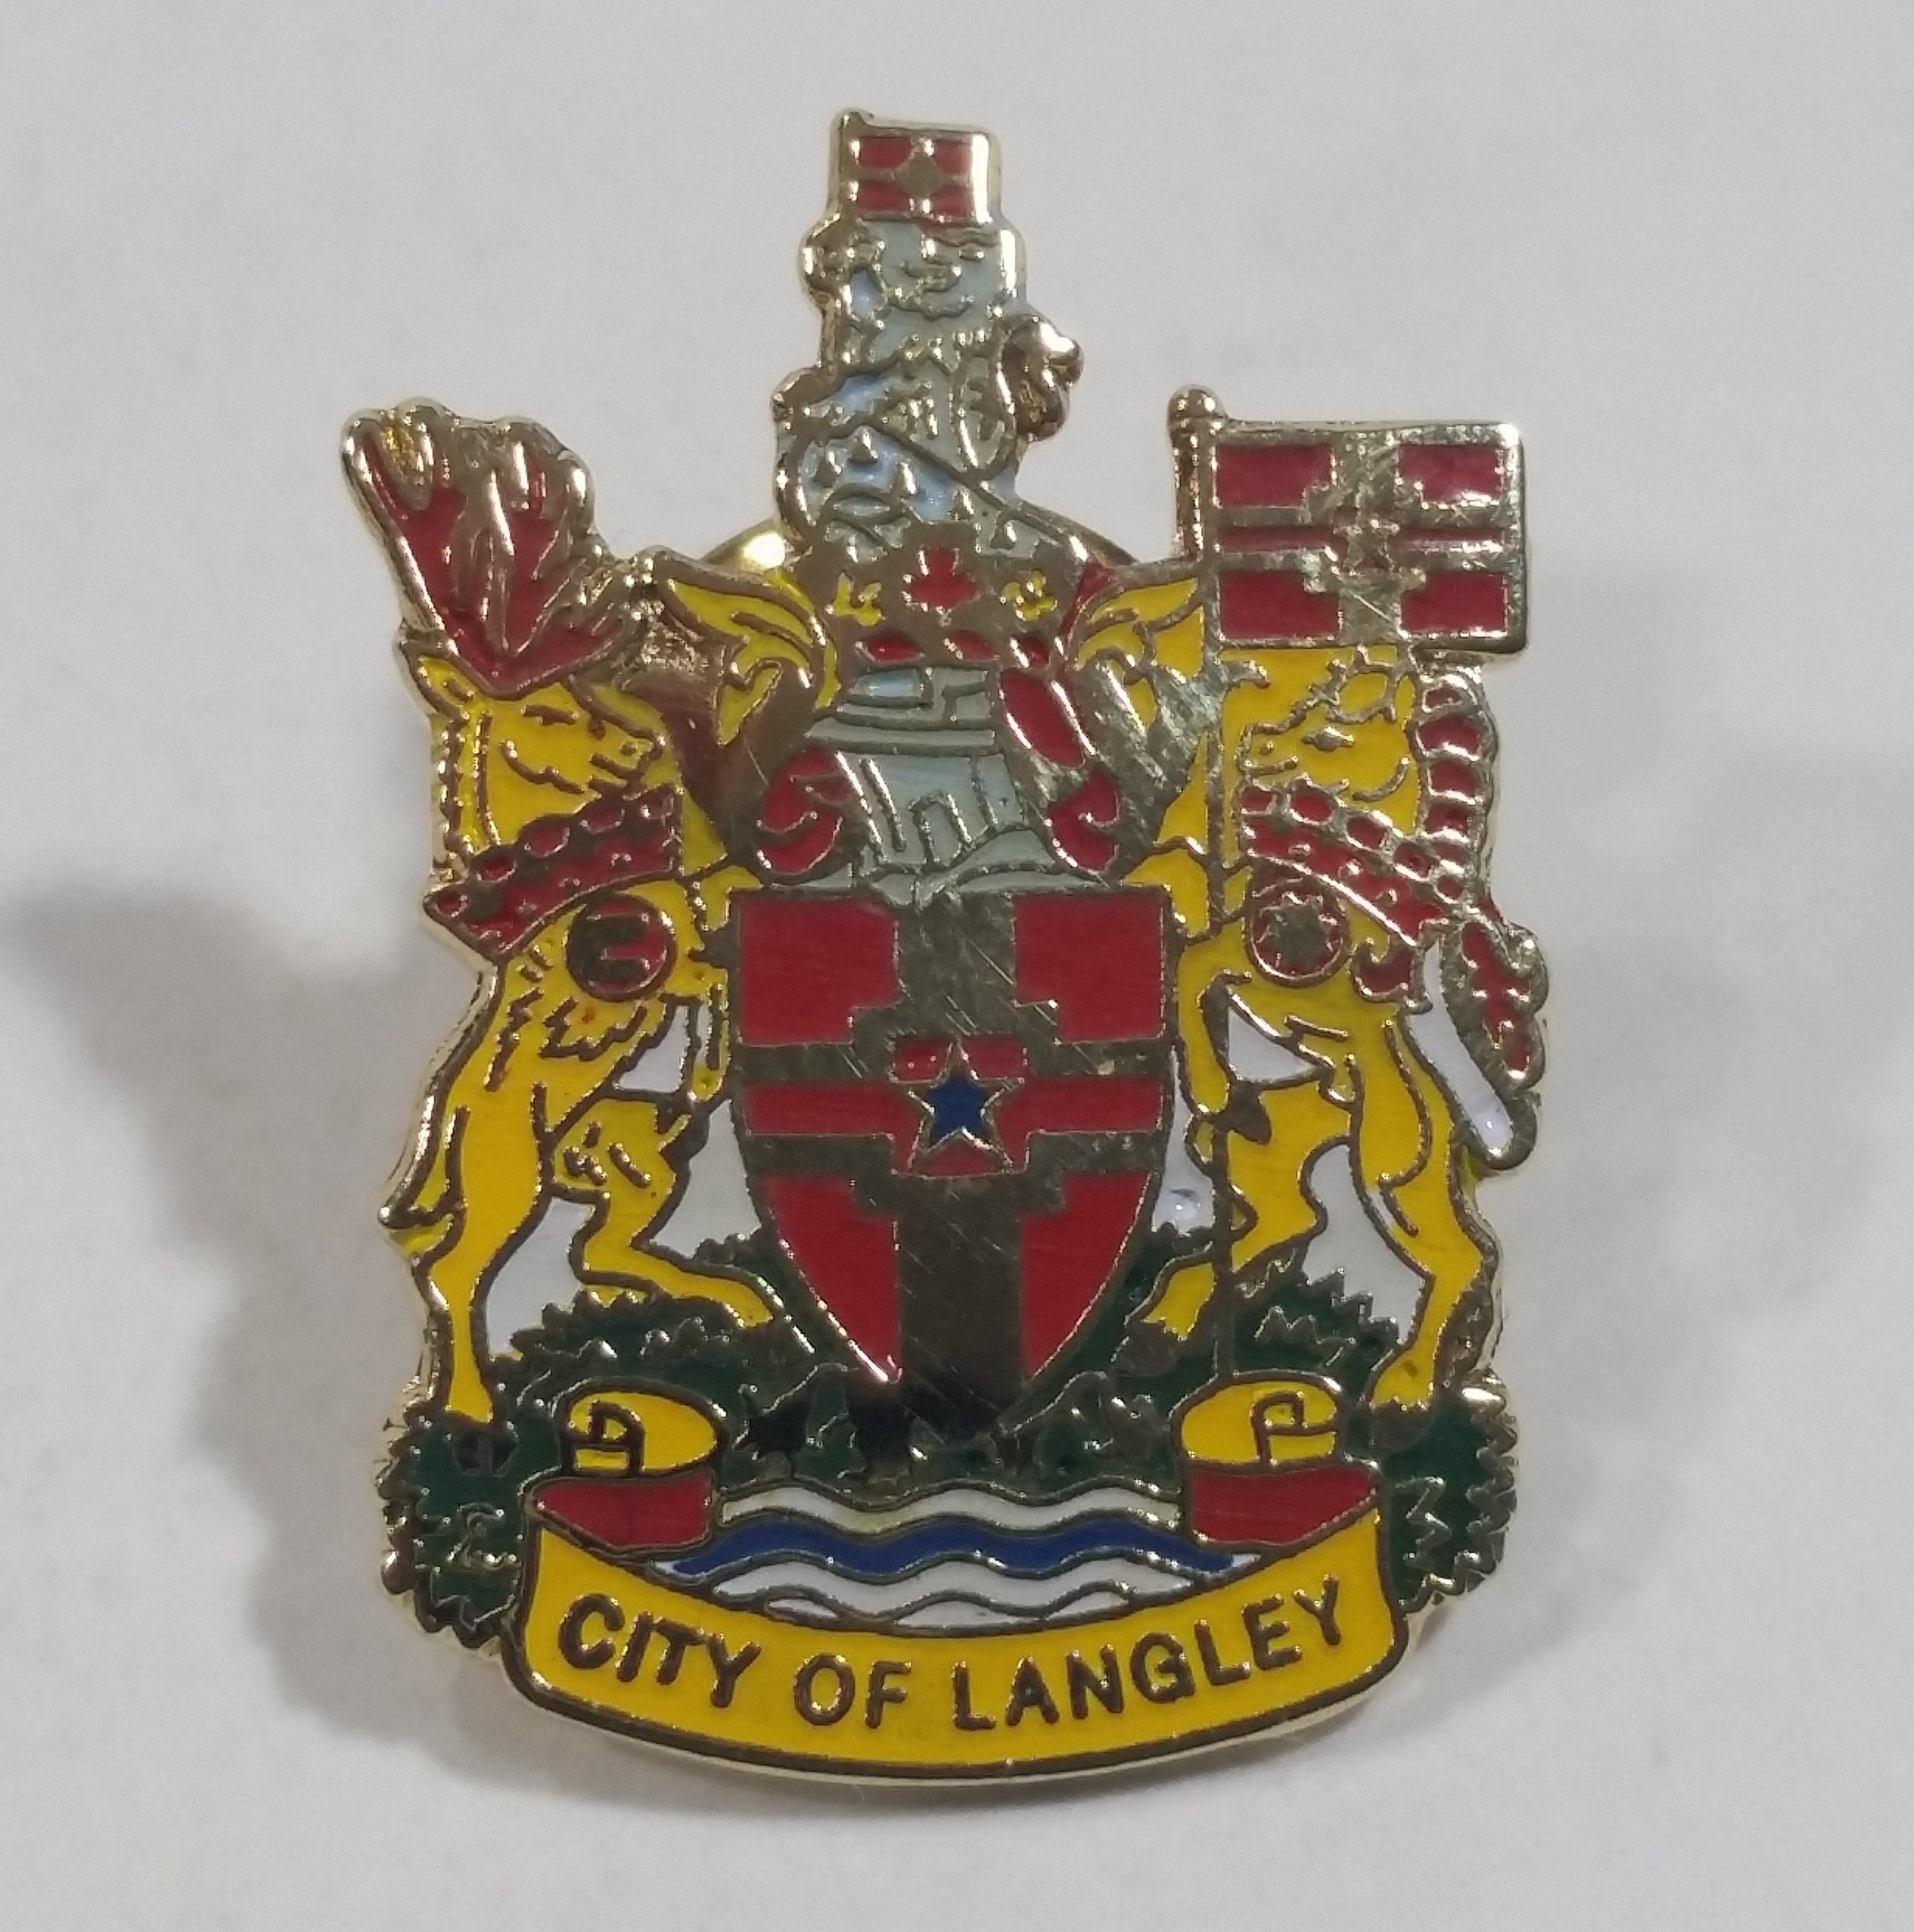 City of langley british columbia canada enamel metal